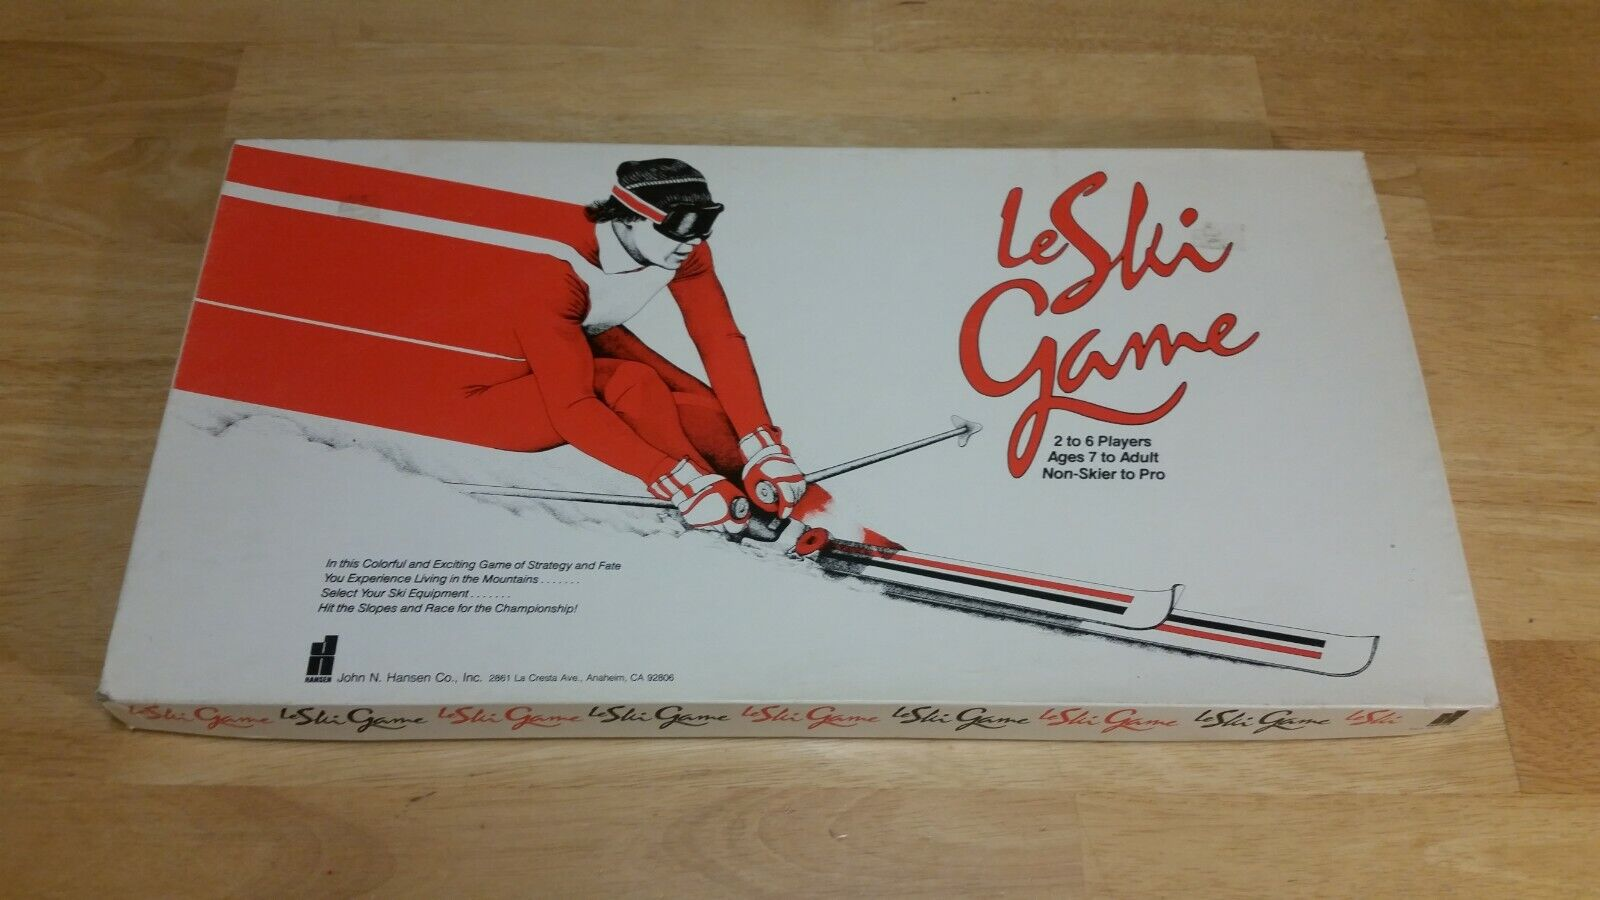 Le Ski Game H123 Board Game John N. Hansen - RARE